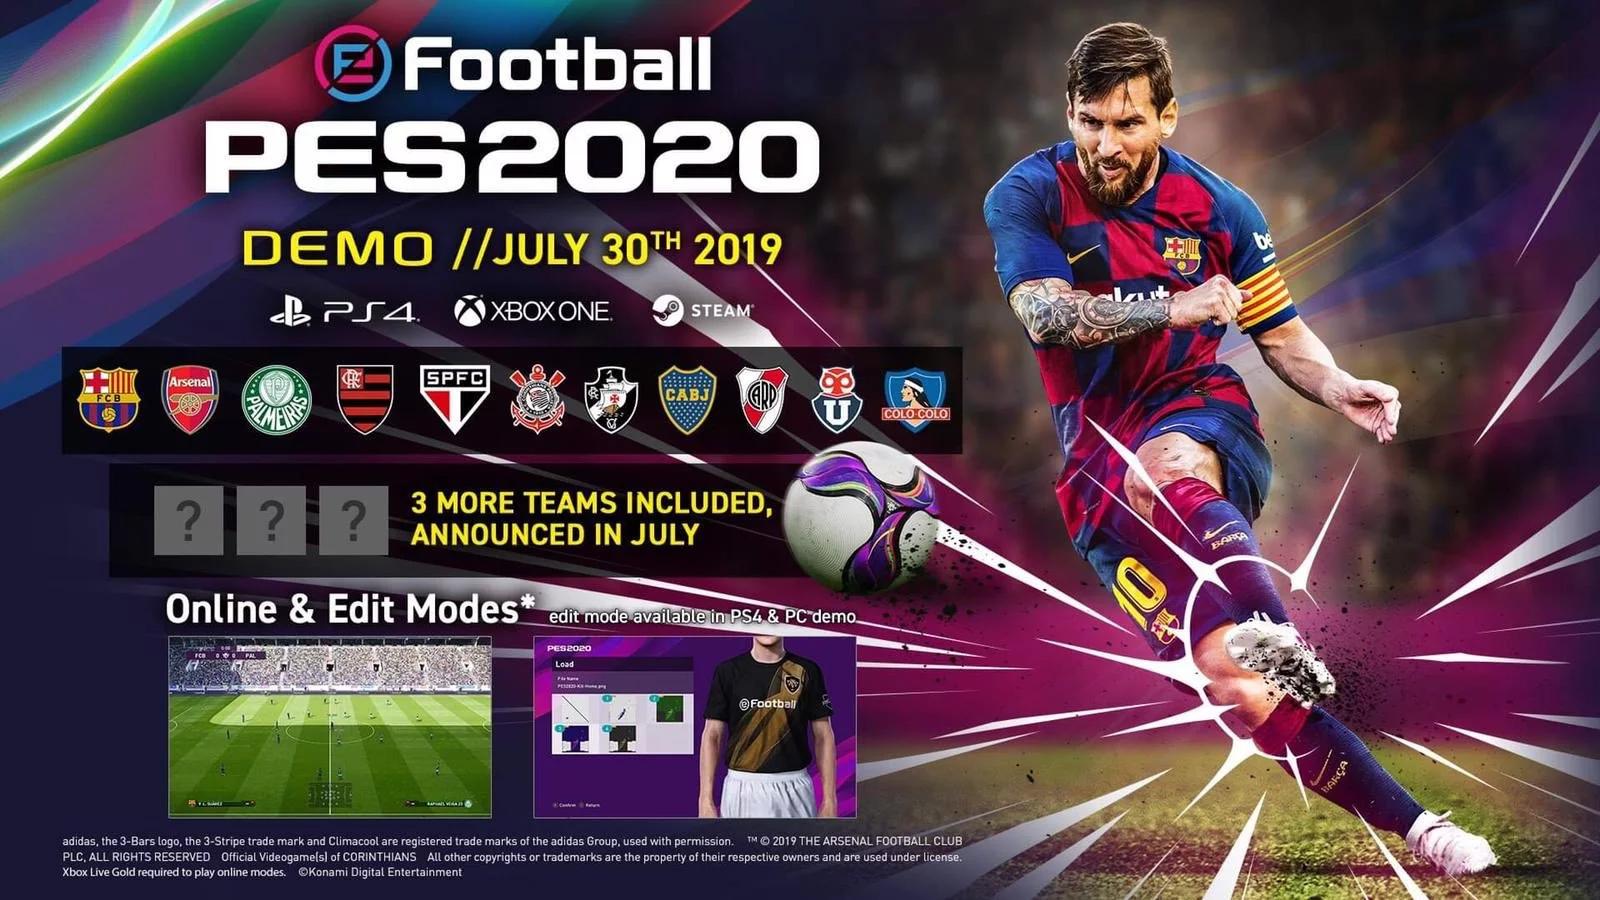 Démo eFootball PES 2020 30 Juillet 2019